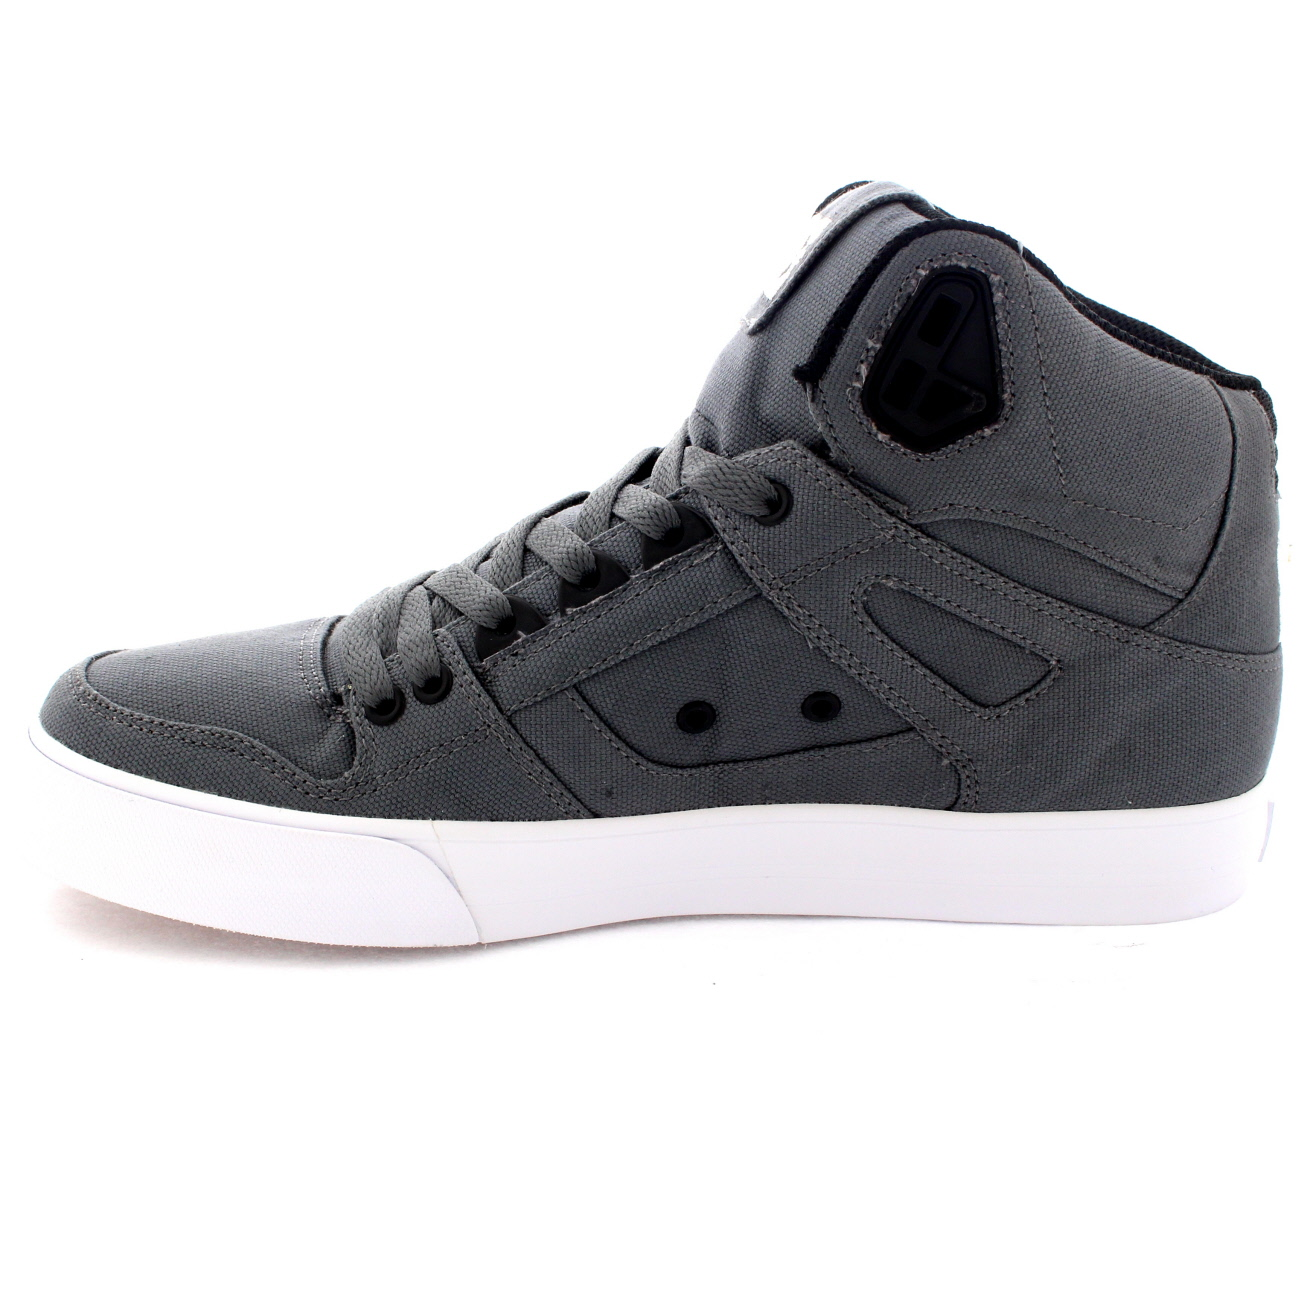 Dc Shoes Alta Tops Reino Unido uOVHLJX